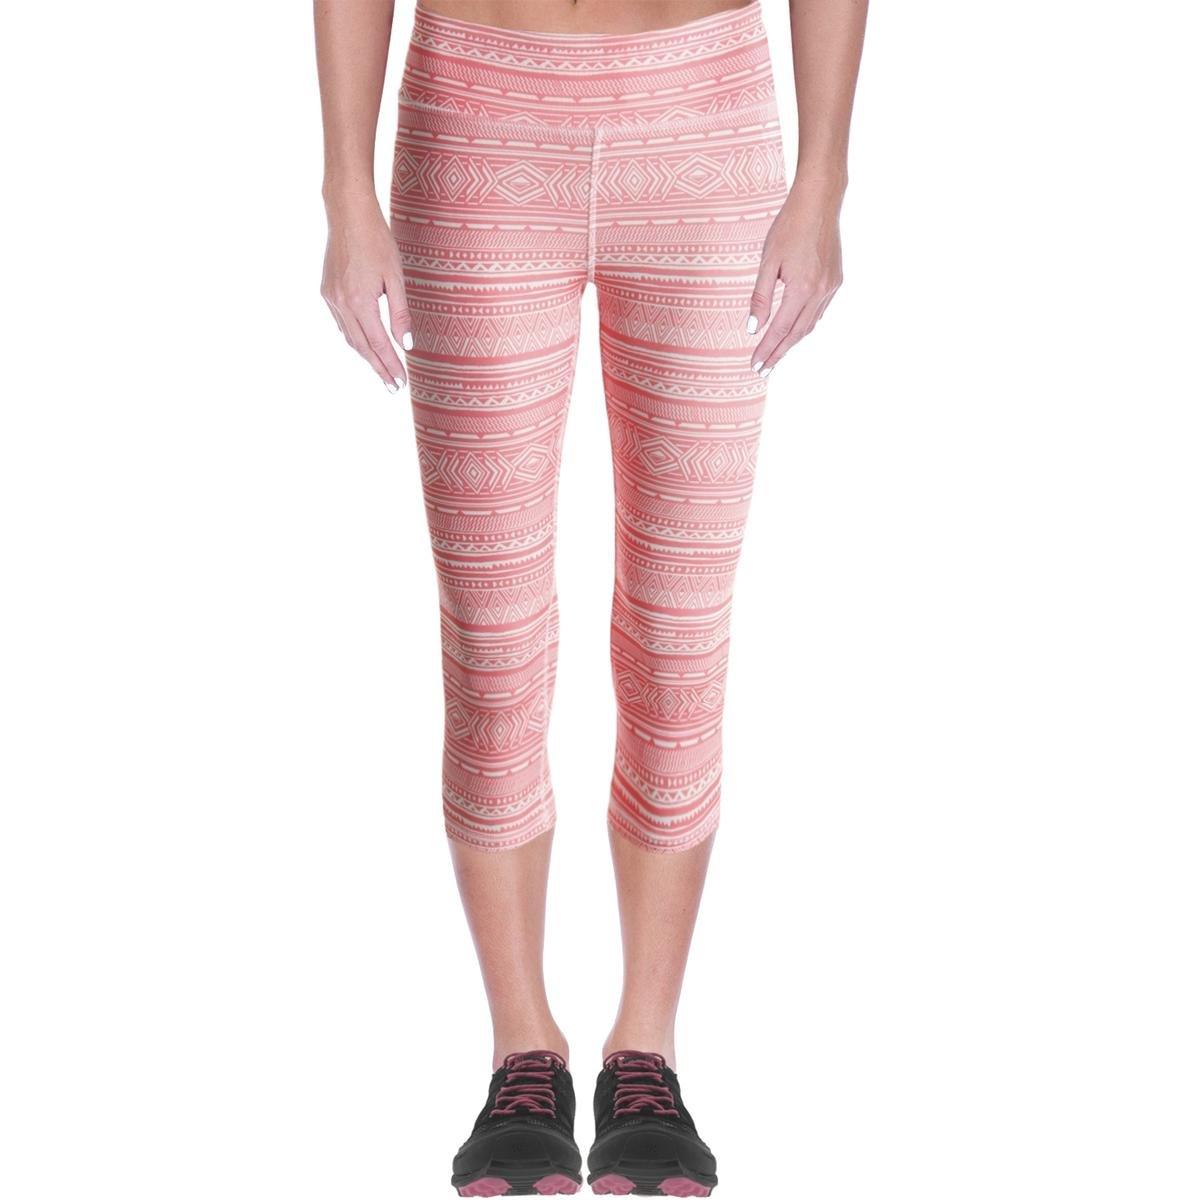 Energie Active Junior's Paula Cropped Leggings Neon Melon Tribal S 60426430